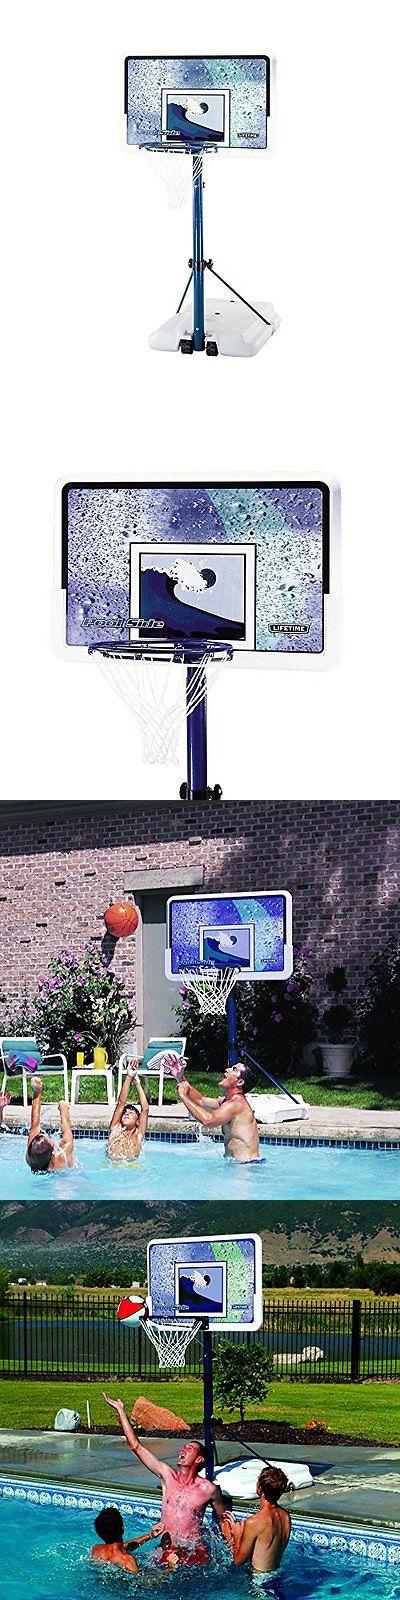 Backboard Systems 21196: Lifetime 1301 Pool Side Basketball System, 44 Inch Backboard New -> BUY IT NOW ONLY: $147.39 on eBay!